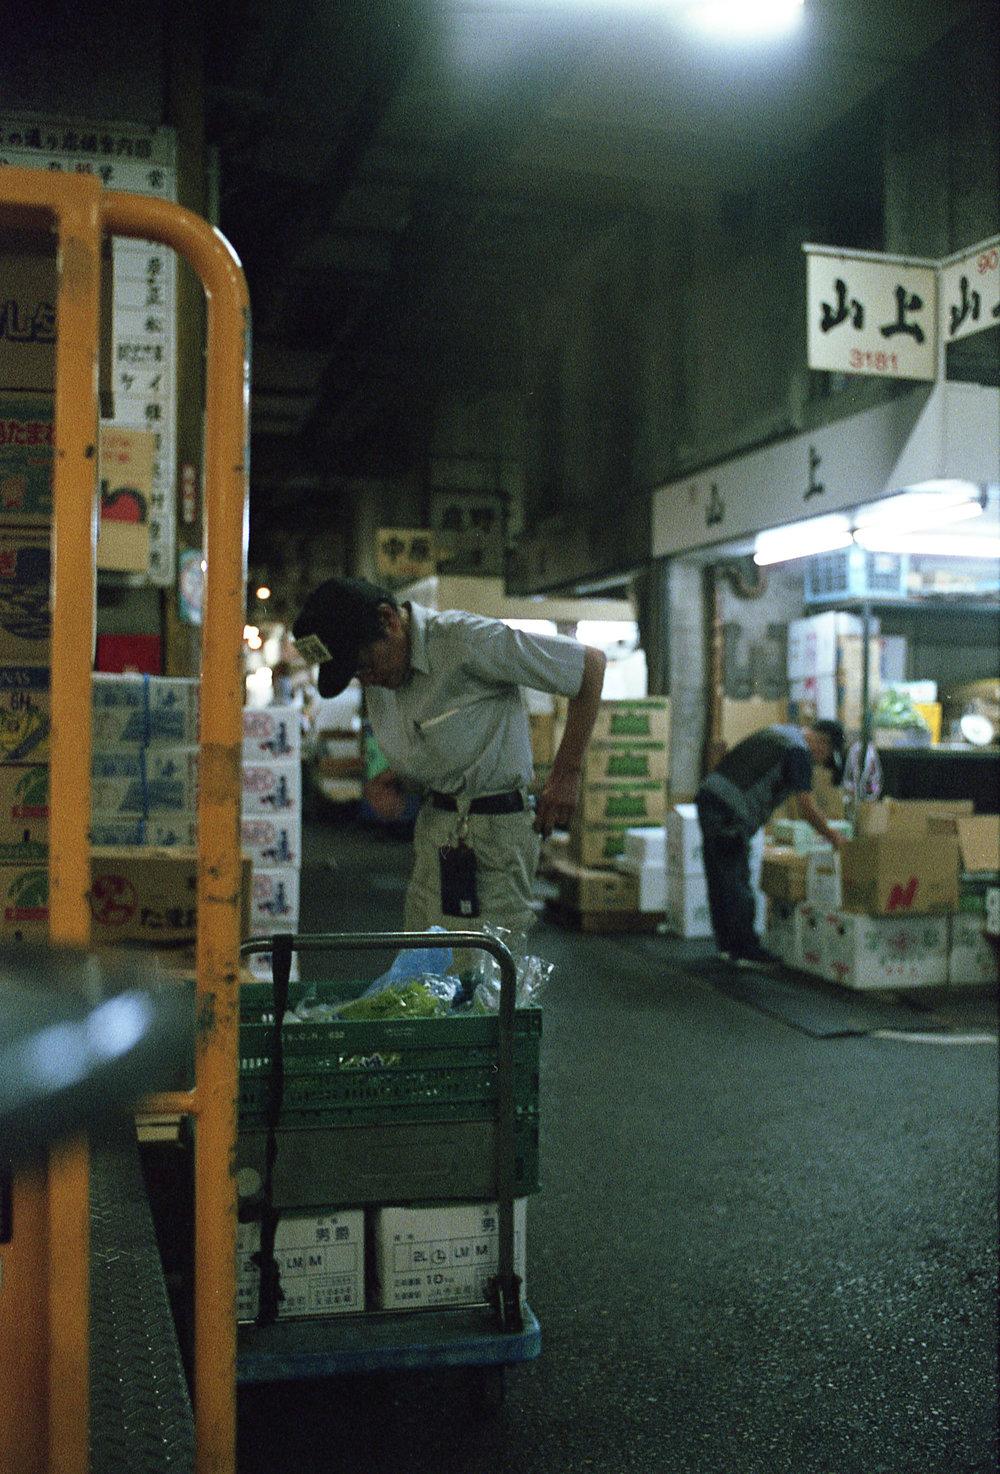 20180830_TsukijiMarket_015s.jpg